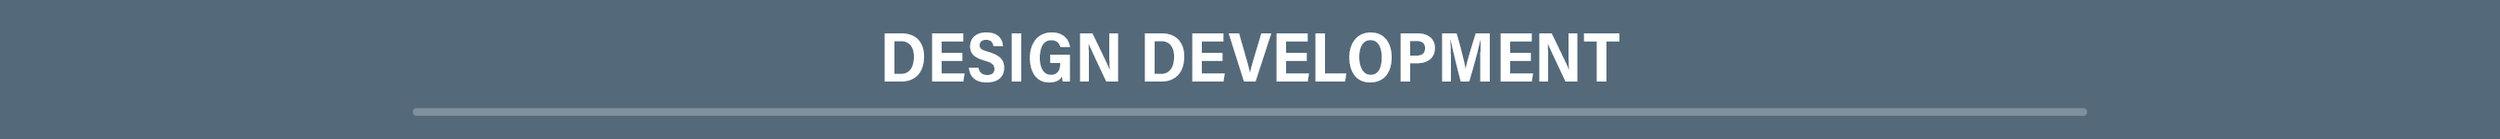 Services Design Development